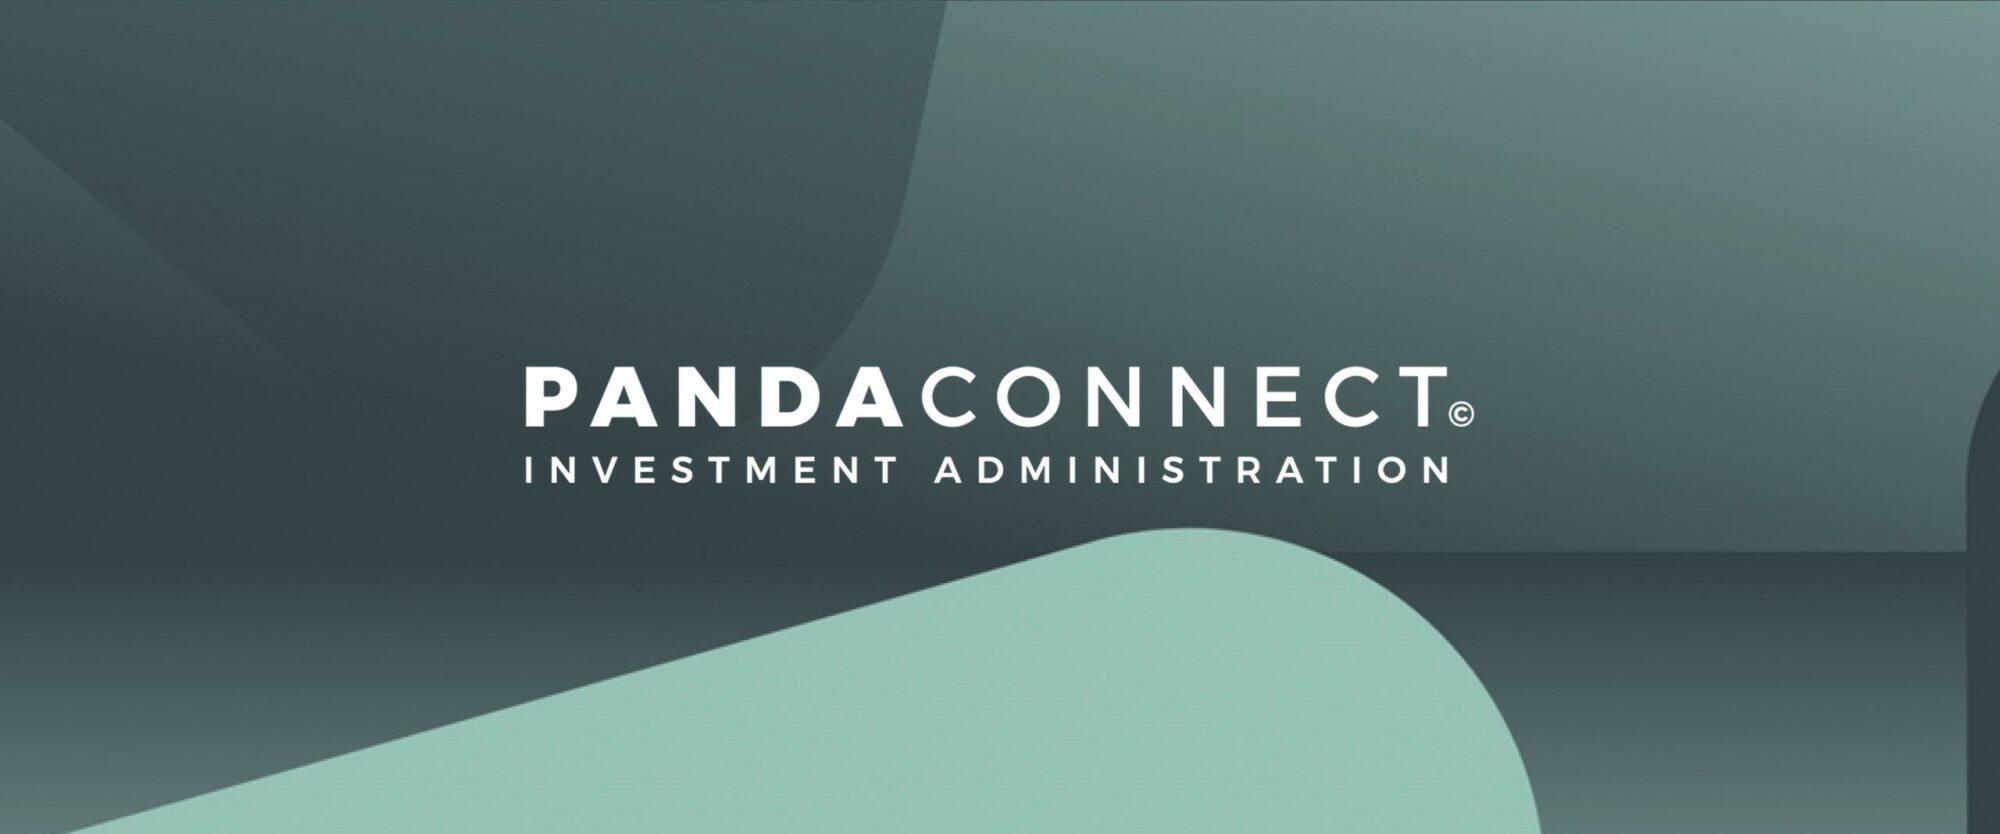 Panda Connect